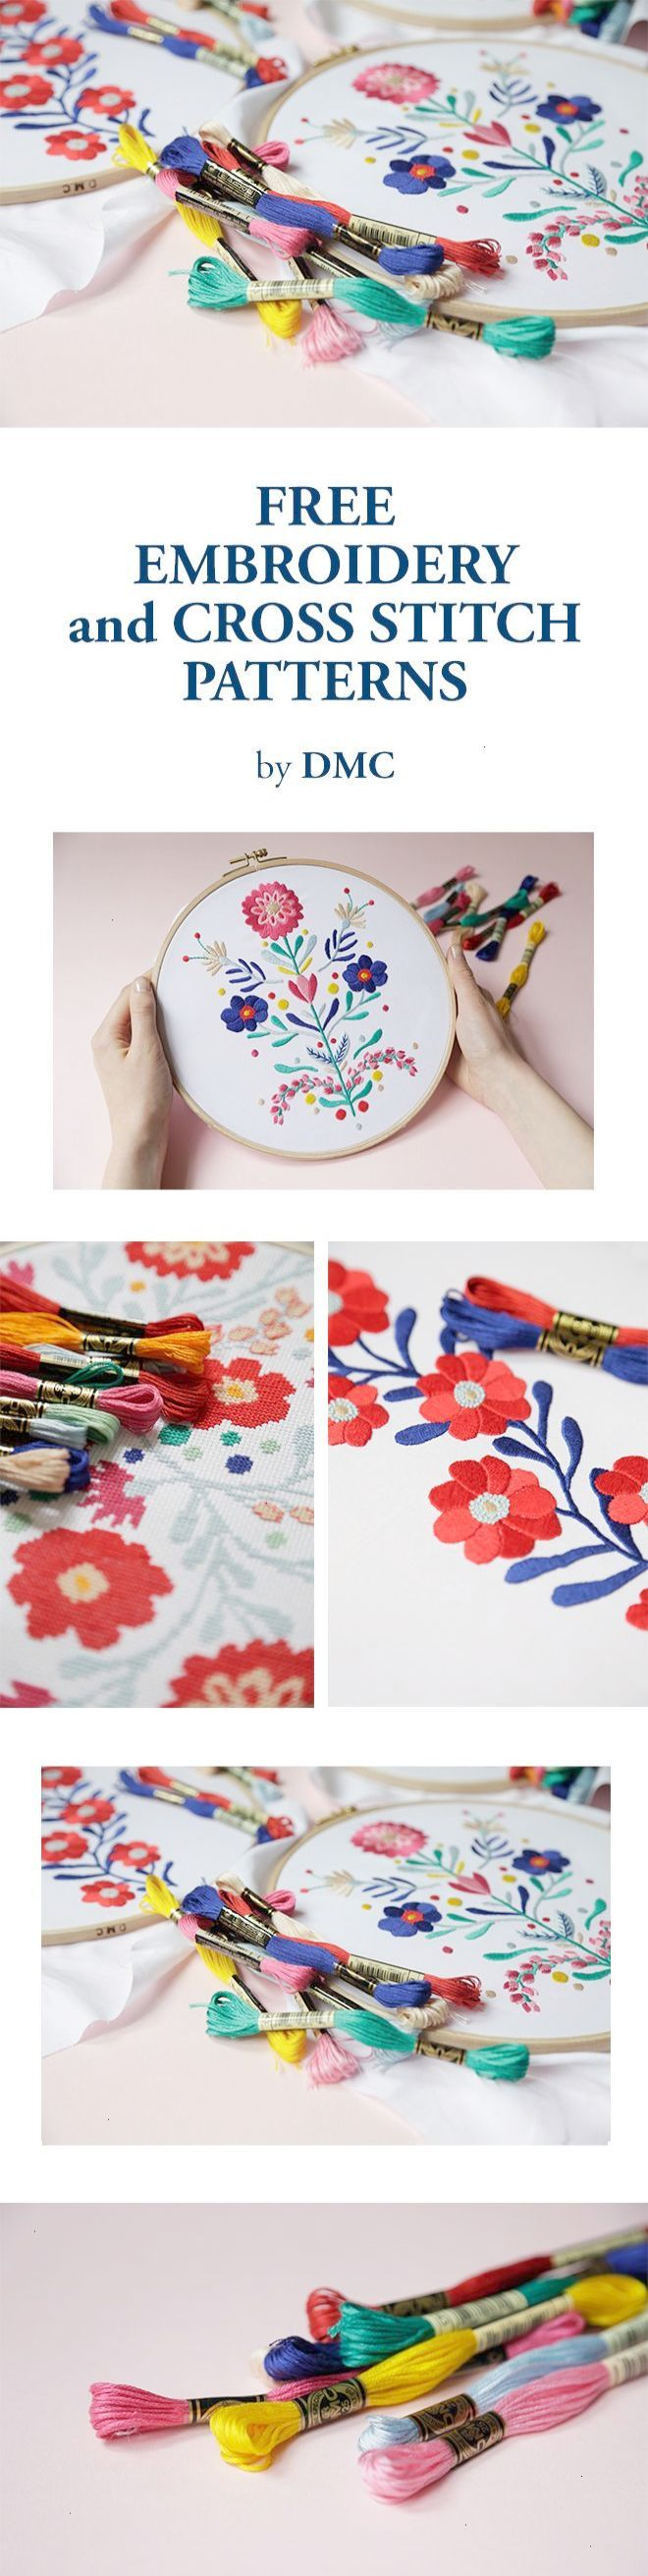 Free embroidery and cross stitch patterns by DMC | cross stitch ...